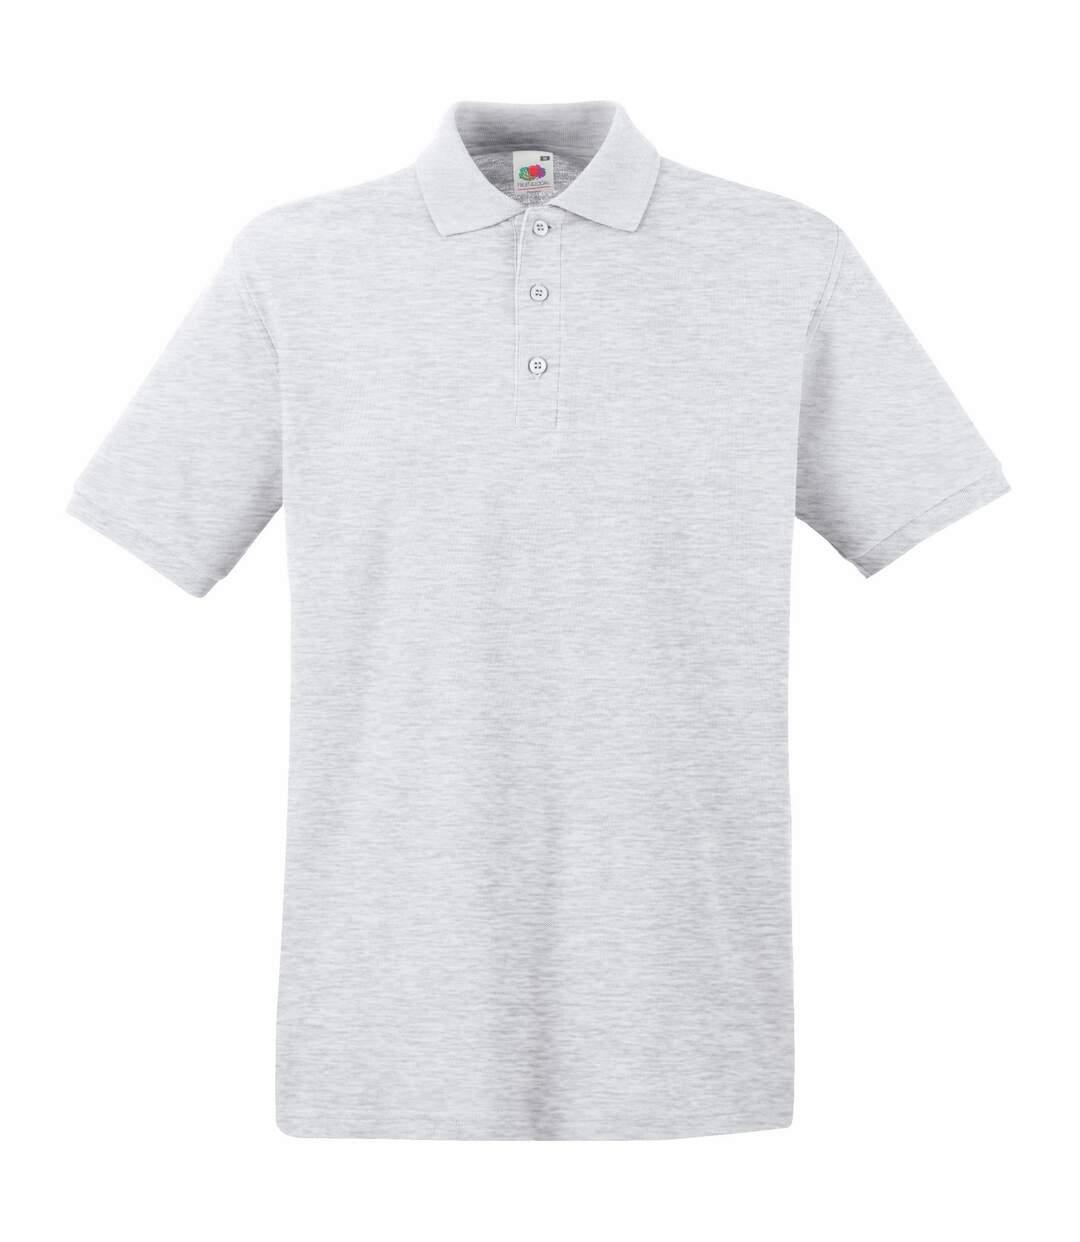 Fruit Of The Loom Premium Mens Short Sleeve Polo Shirt (Heather Grey) - UTBC1381